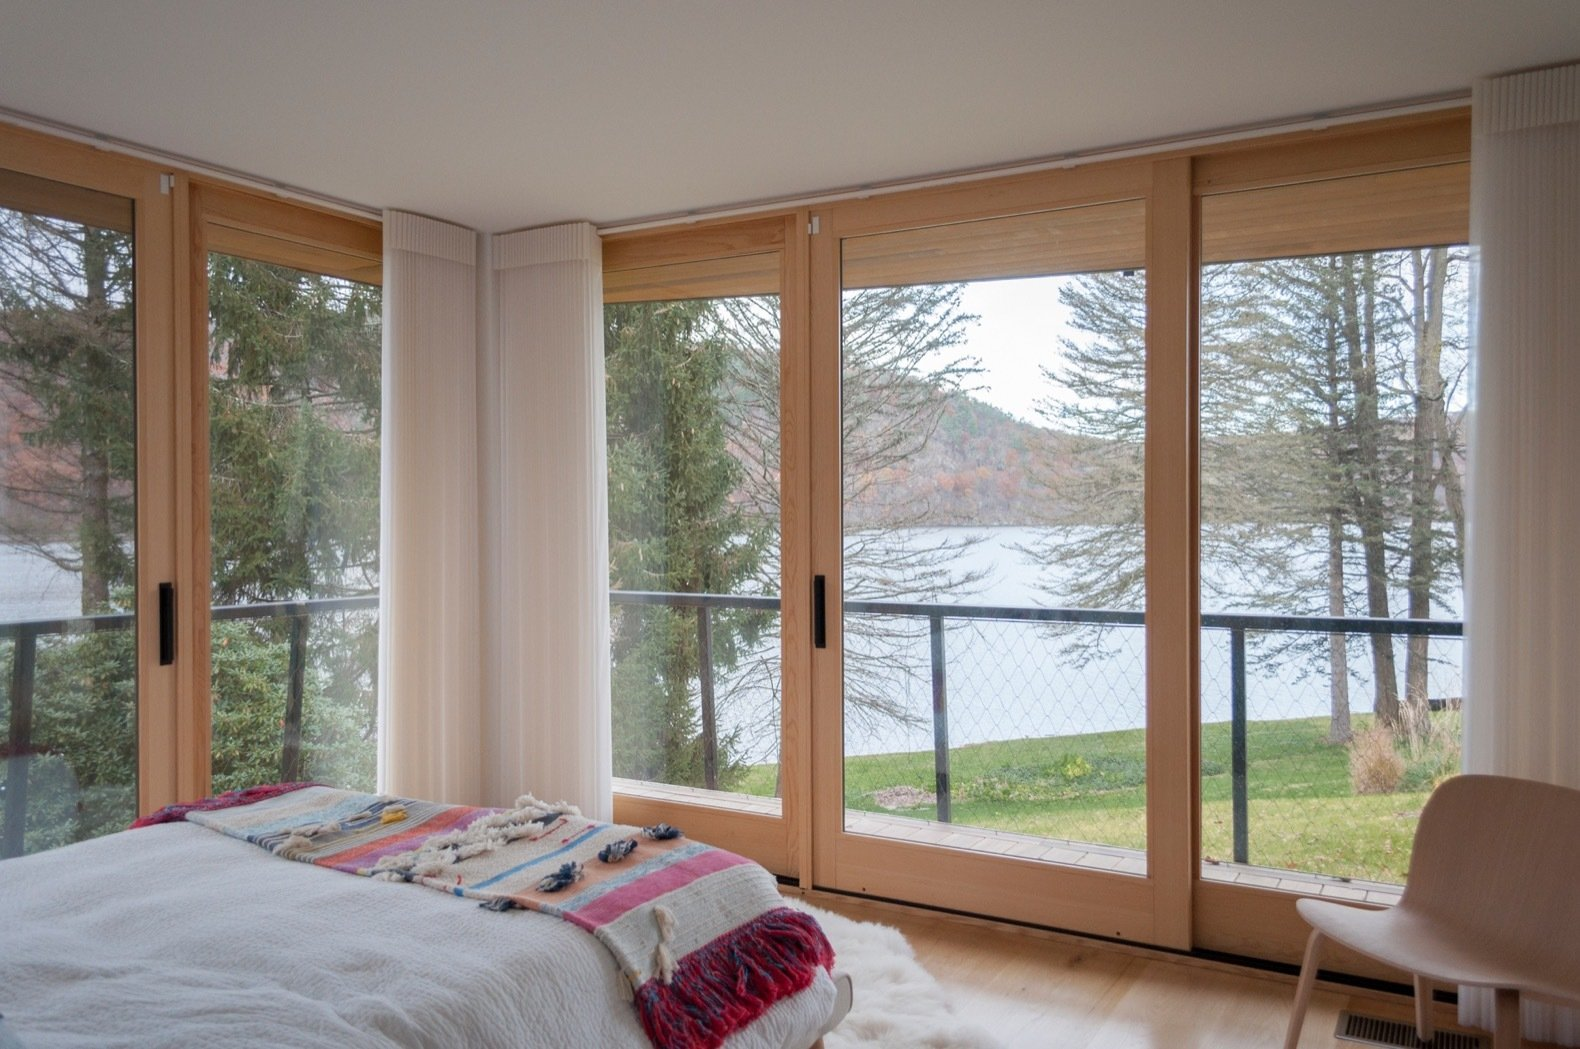 Candlewood Lake House bedroom